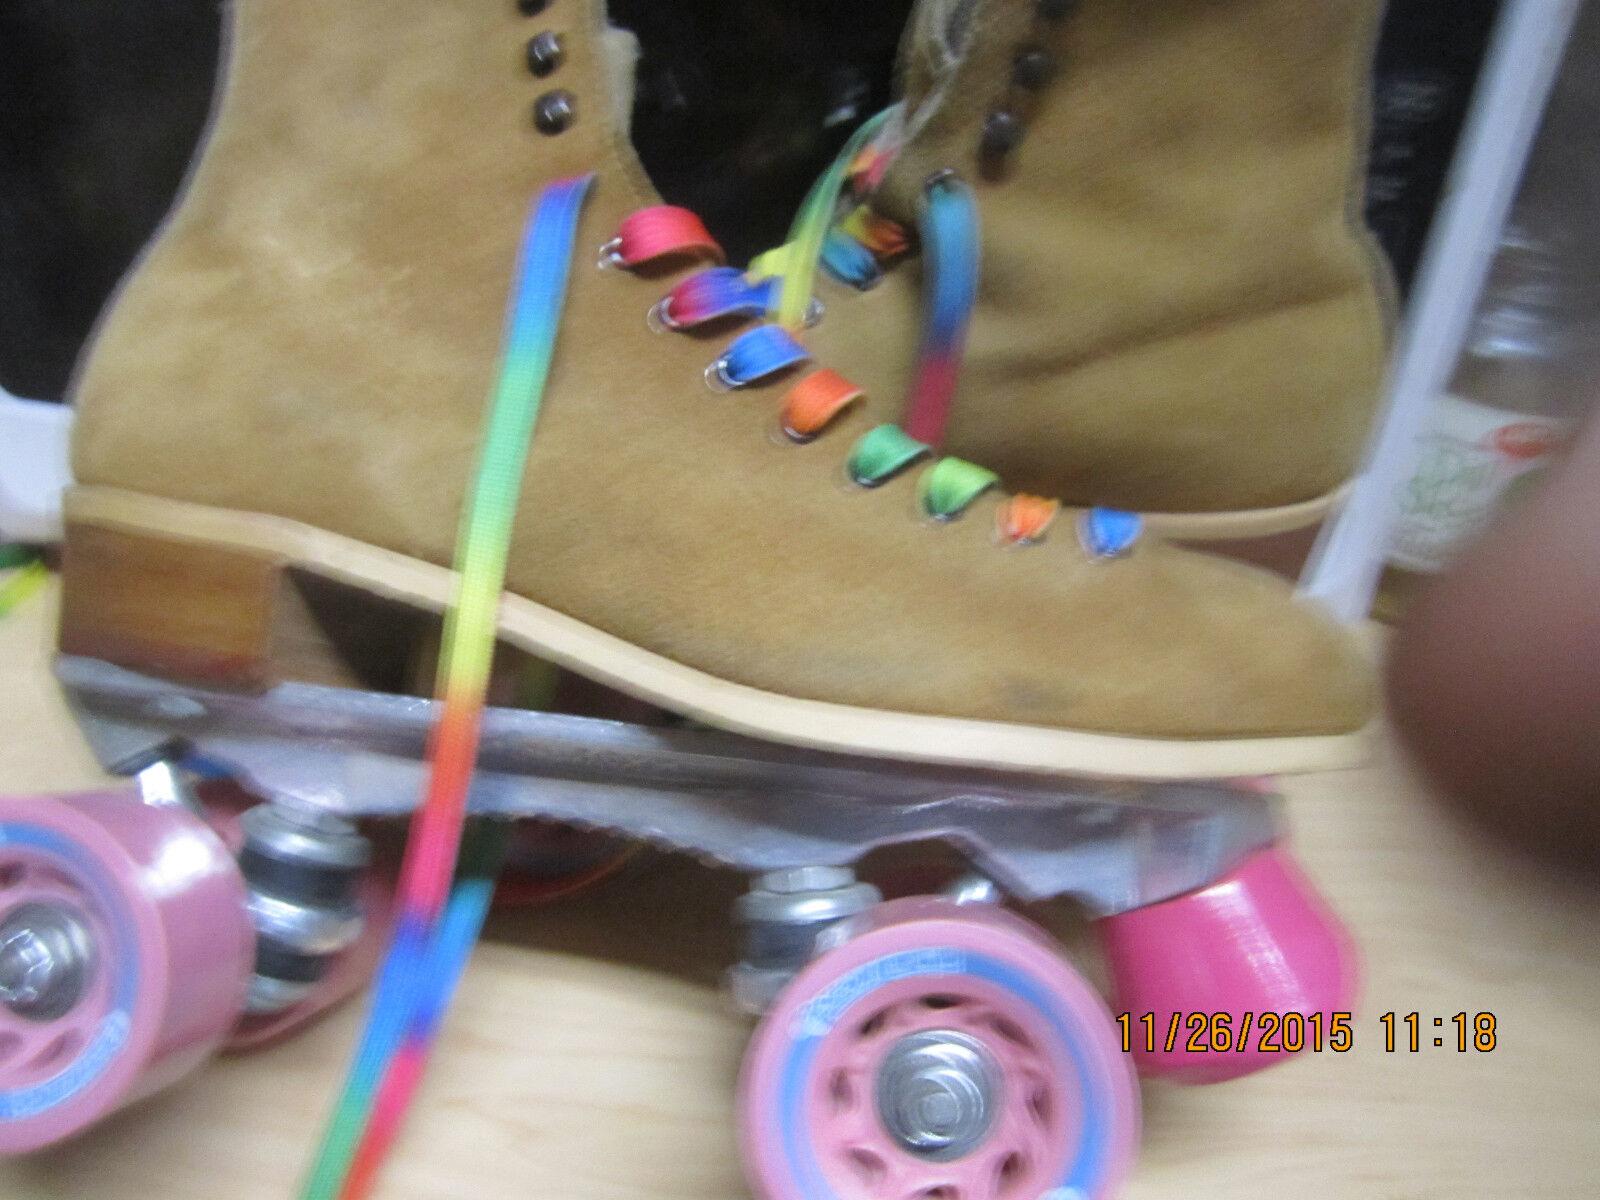 Women   Suede sz 9 Heel to toe  10  3 16  in .  width  3 in JUST FOR YOU